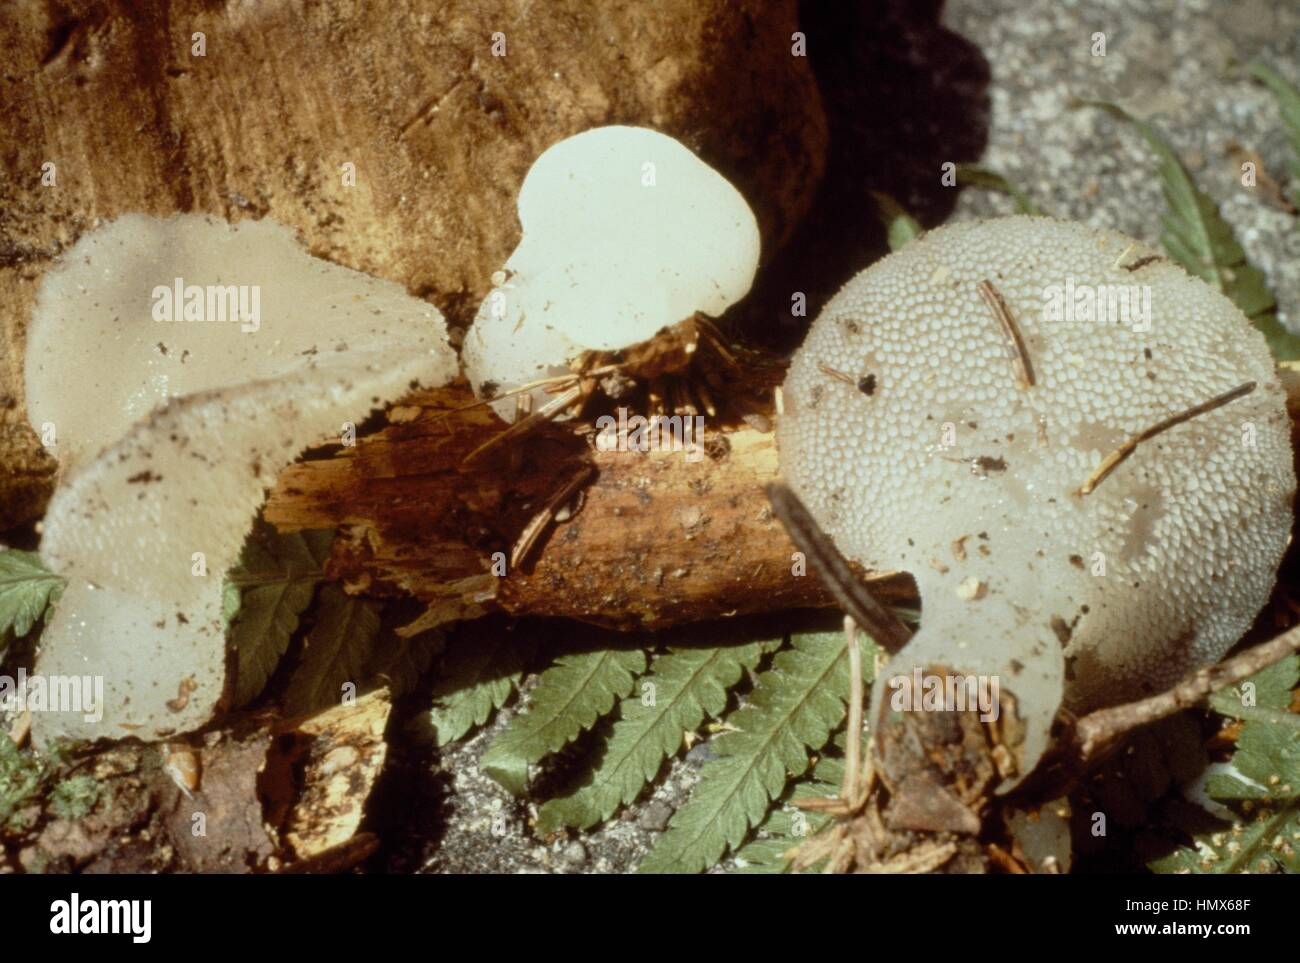 Toothed jelly fungus, False hedgehog mushroom or White jelly mushroom (Tremellodon gelatinosus or Pseudohydnum gelatinosum), - Stock Image